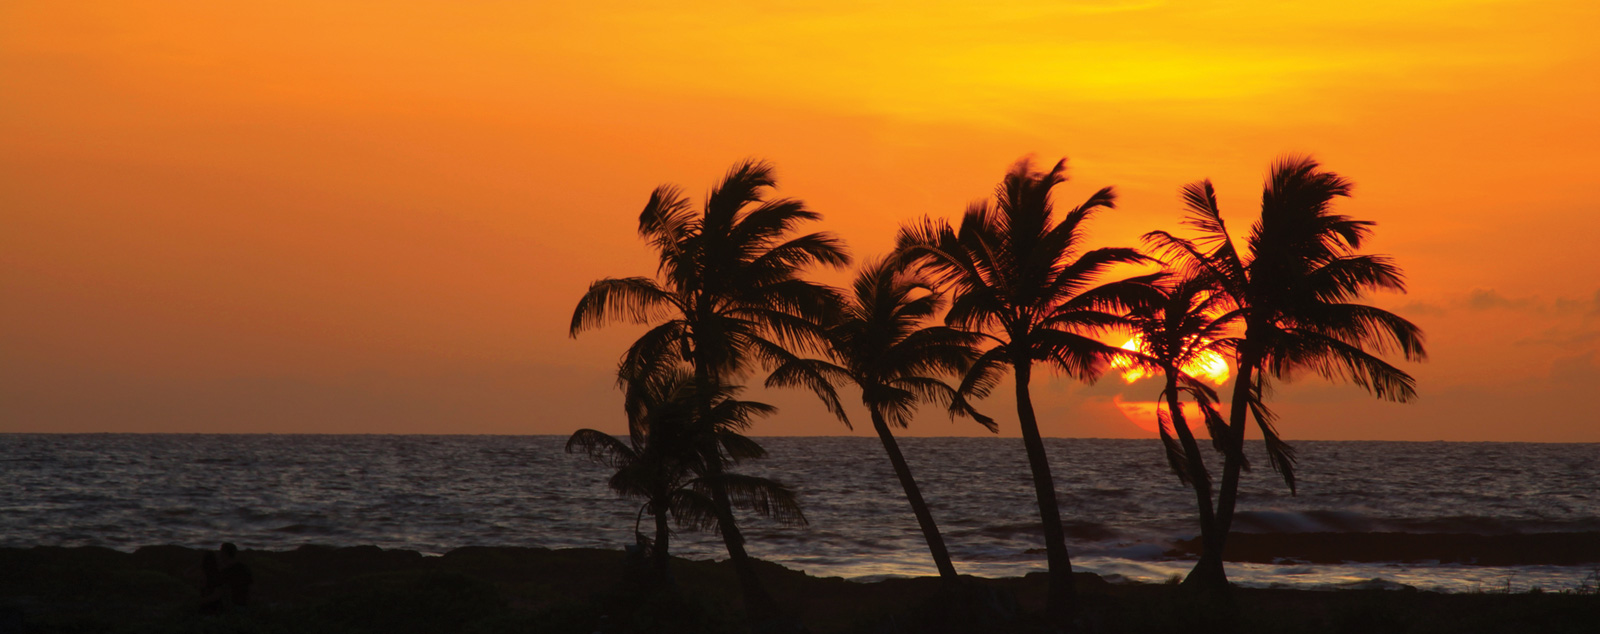 Palm trees sillouhetted against an orange sunset over the ocean.